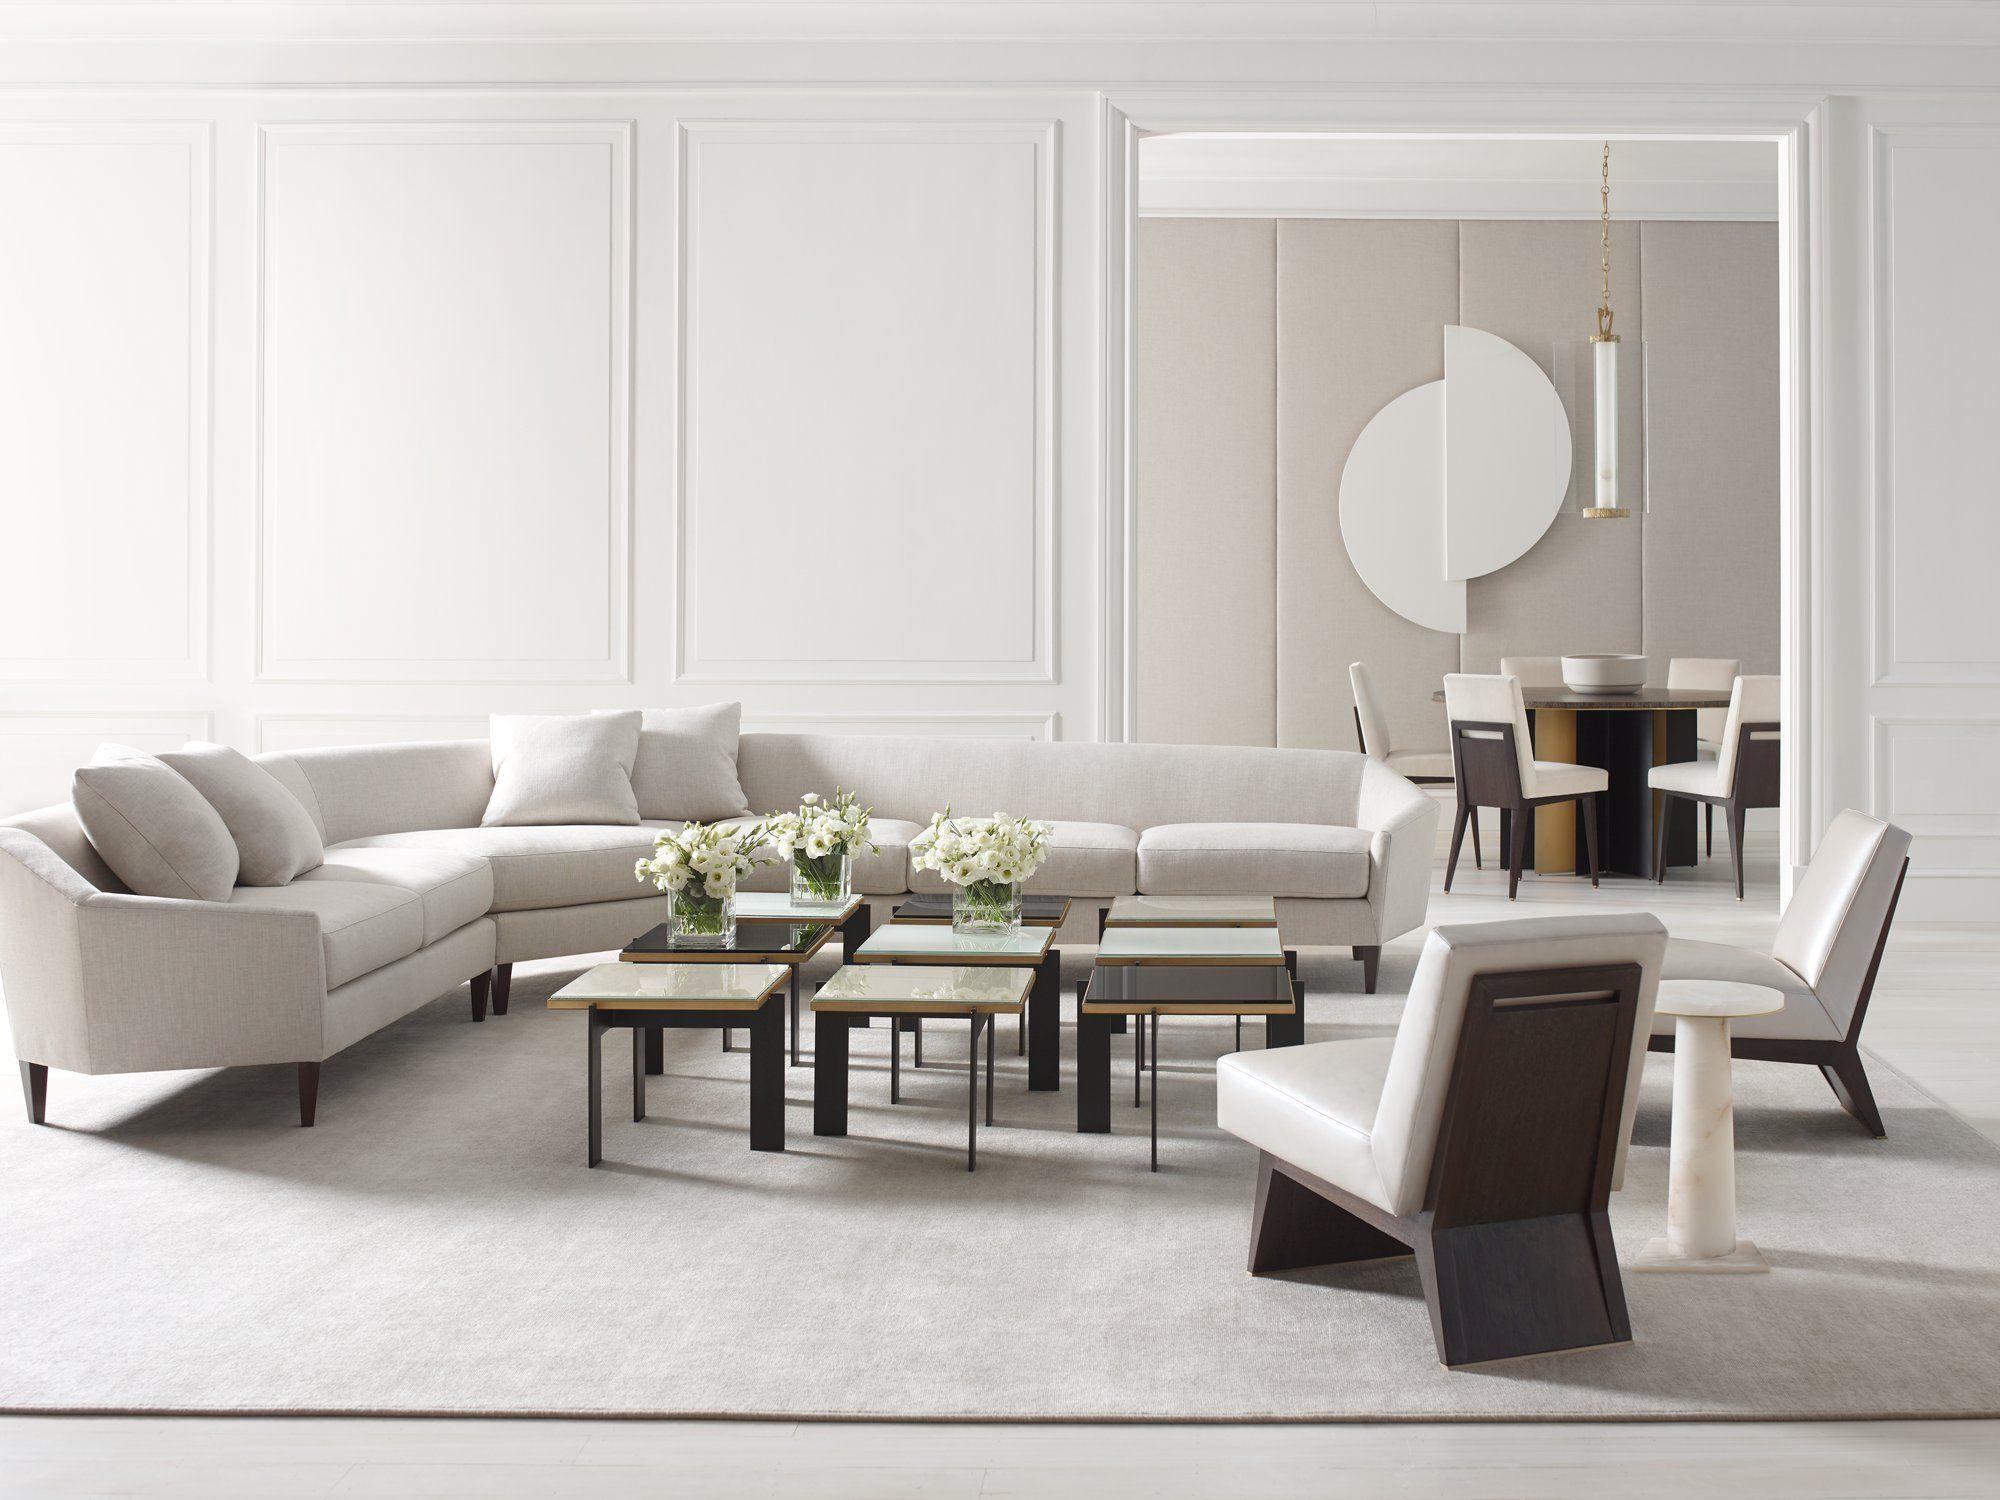 Thomas Pheasant For Baker Furniture Modern Furniture Living Room Baker Furniture Neoclassical Interior